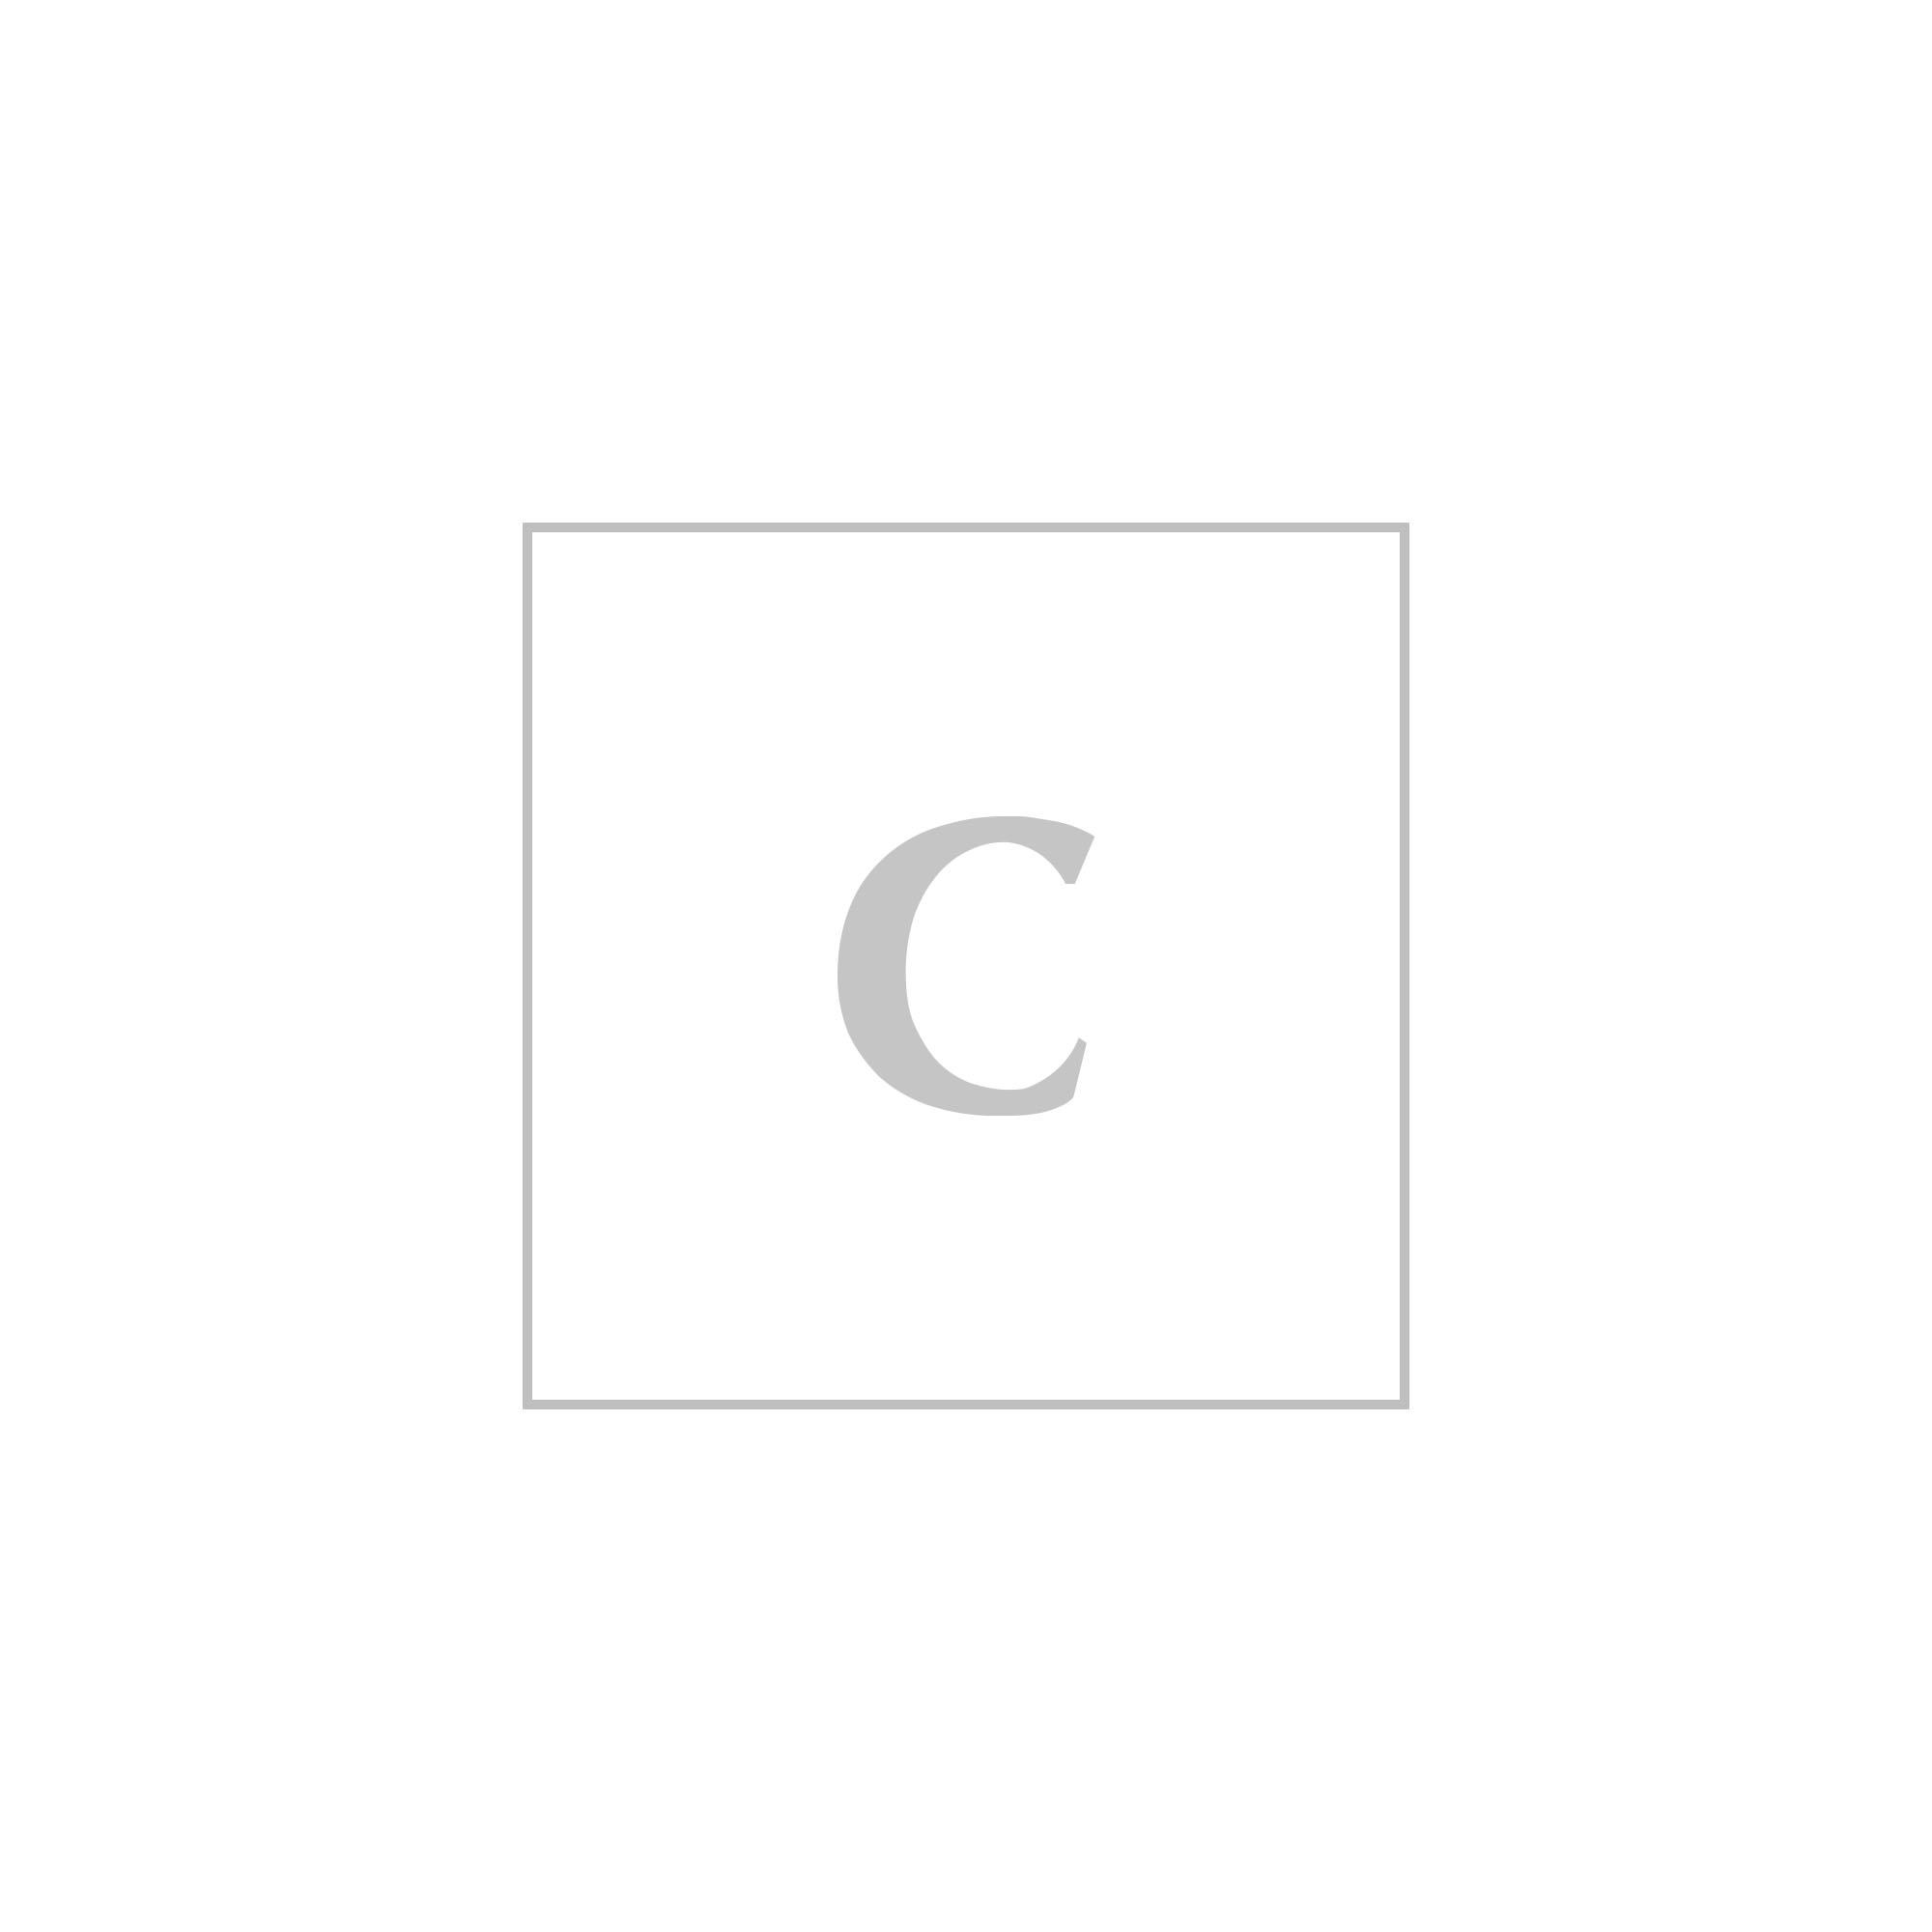 Stella mccartney metallic crackl clutch